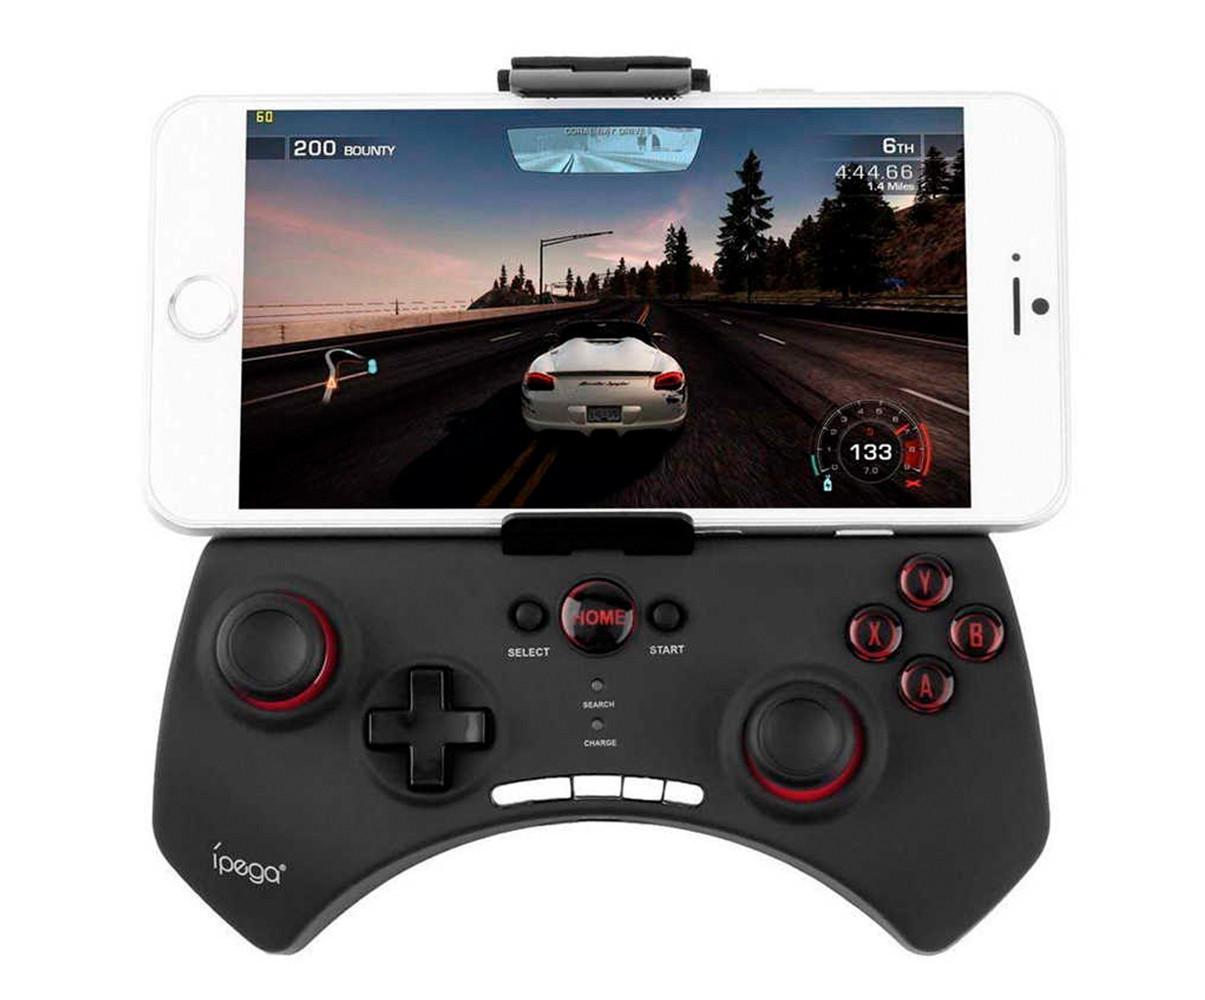 Джойстик IPEGA 9025 Bluetooth V3.0 для игр на смартфоне